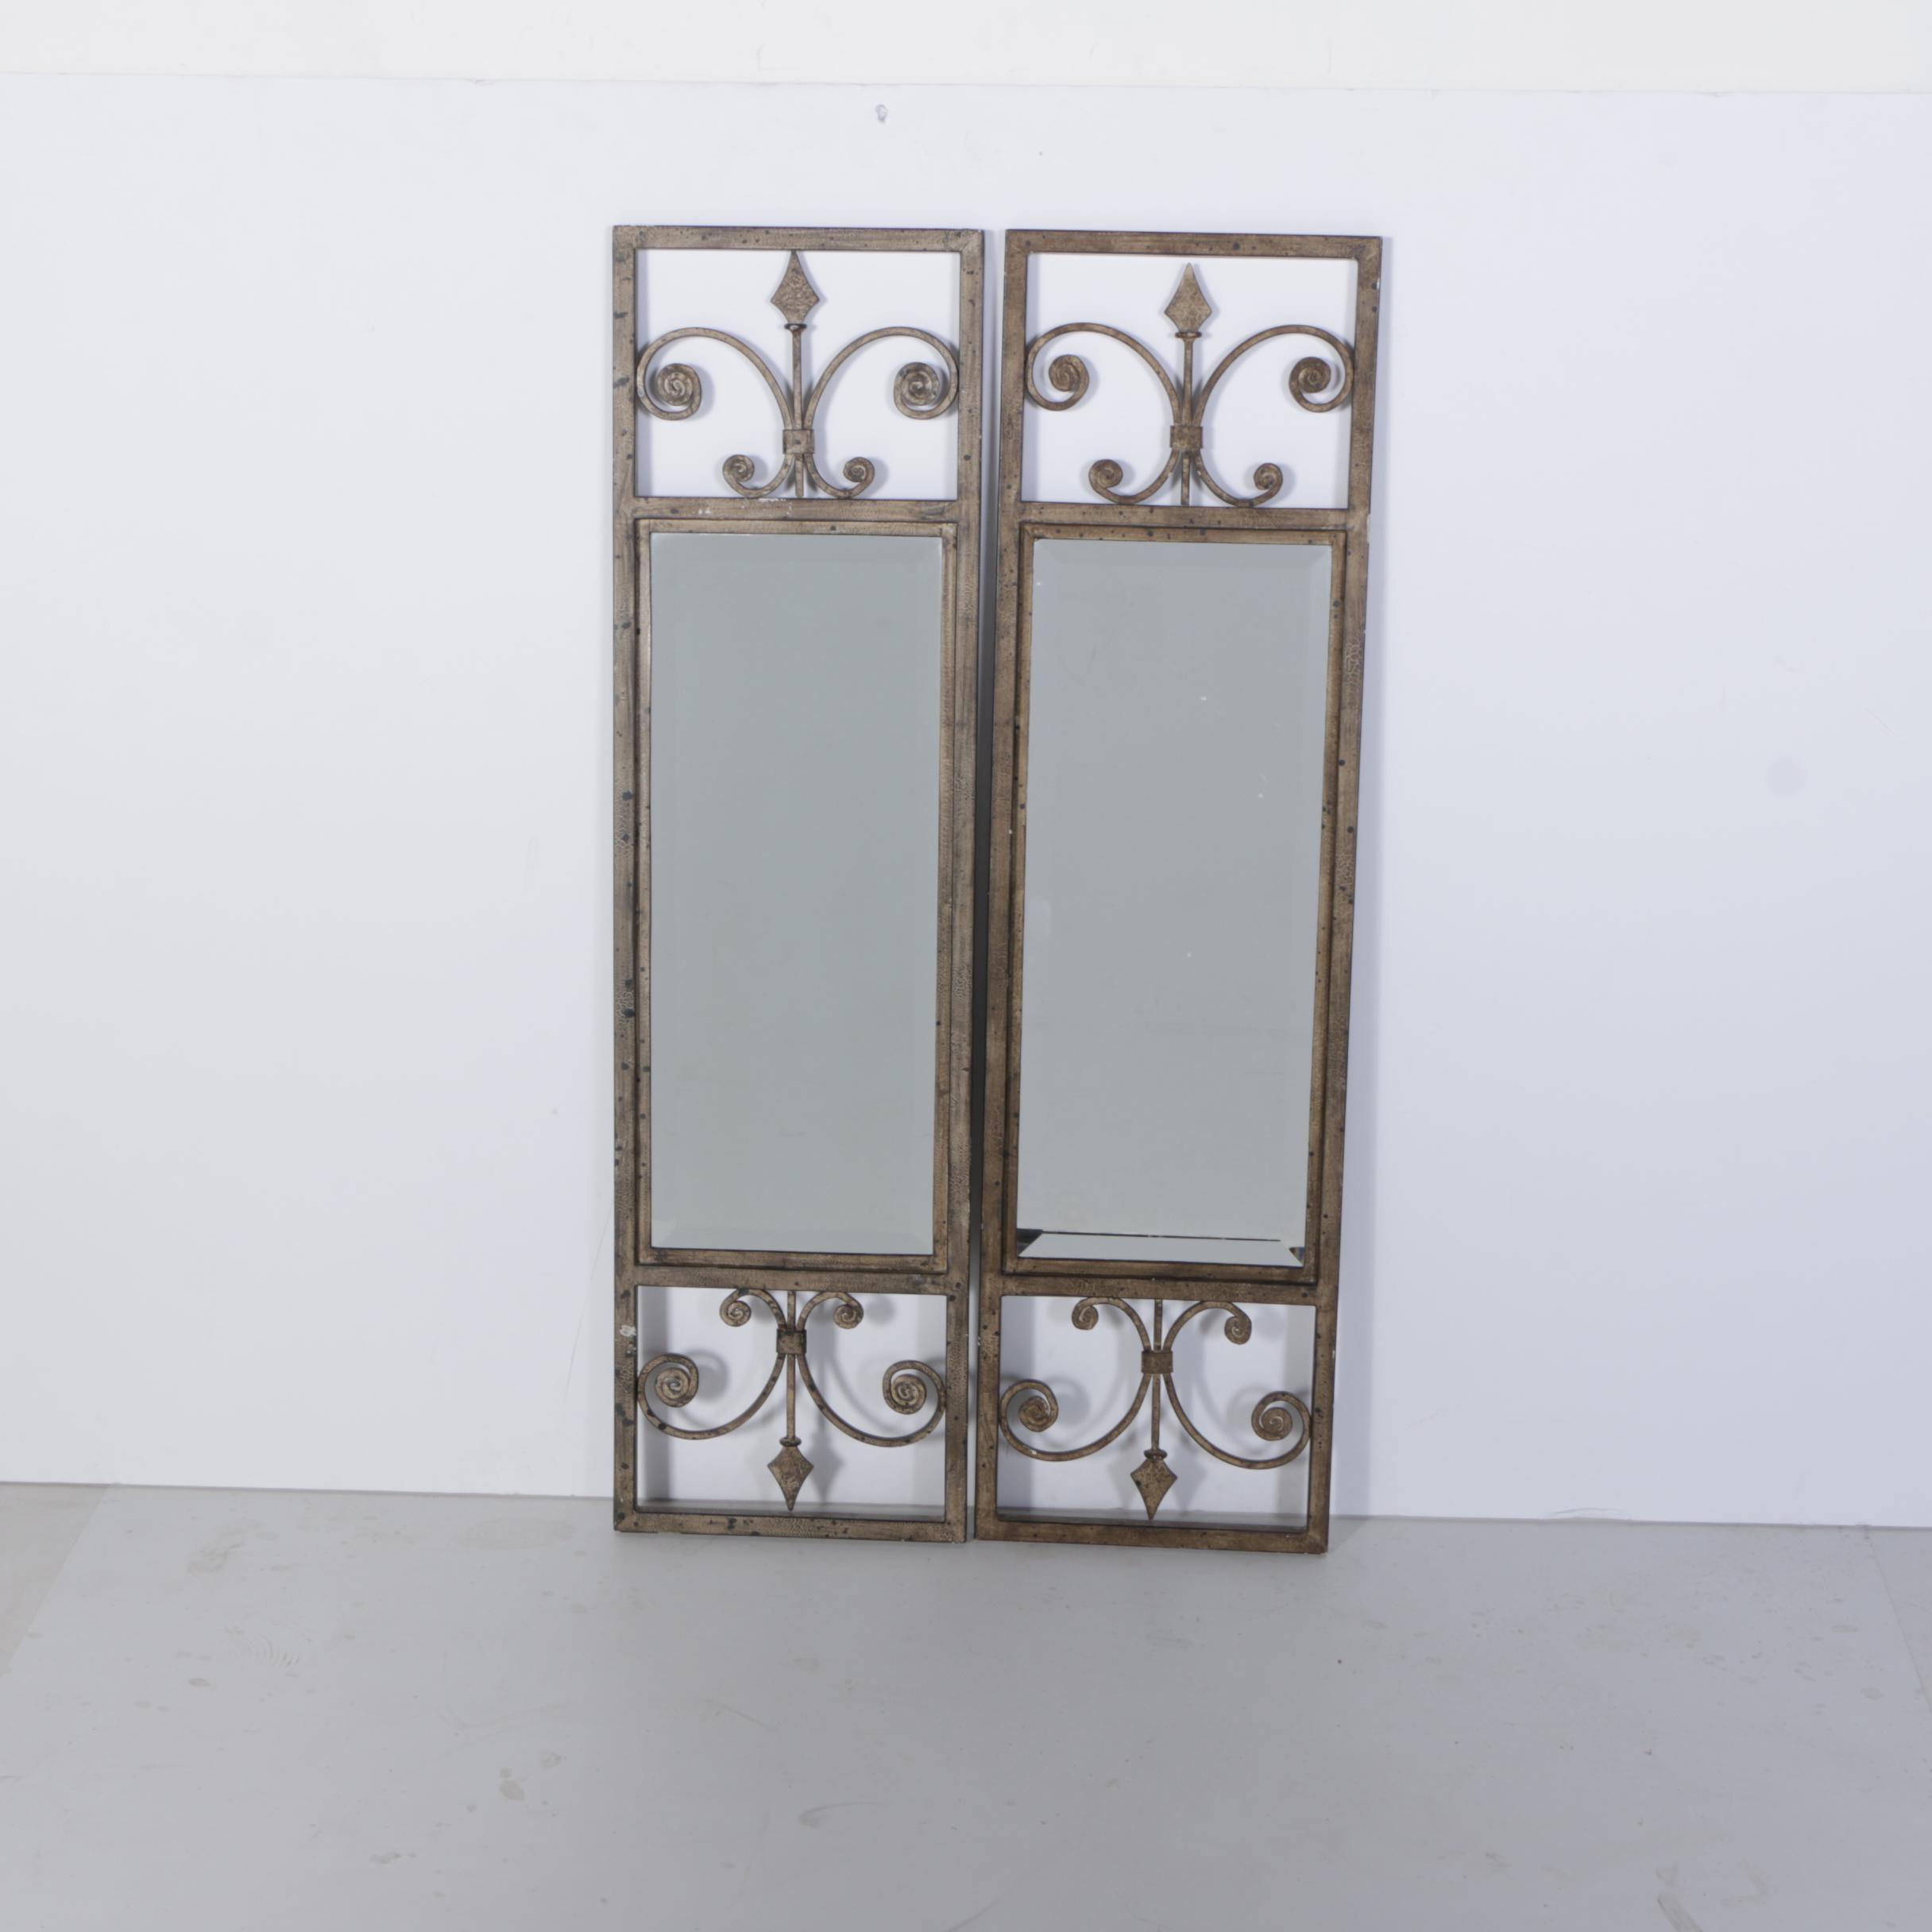 Metal Framed Fleur De Lis Motif Wall Mirrors